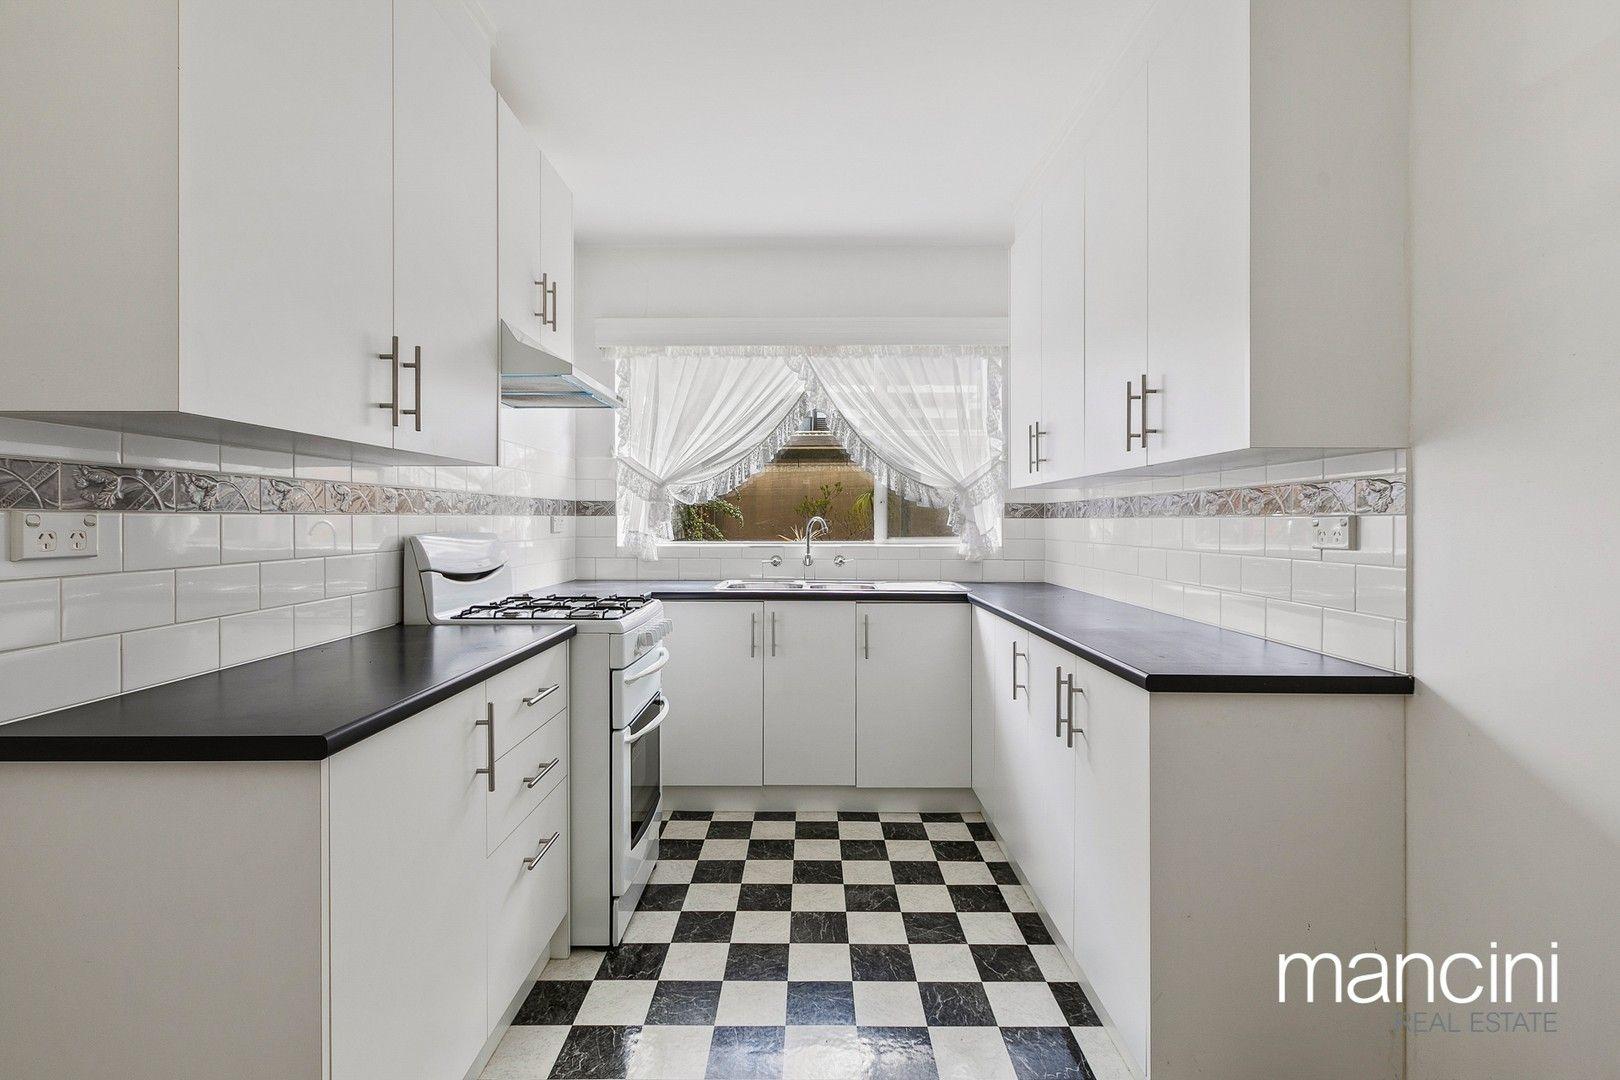 2 bedrooms Apartment / Unit / Flat in 5/83 Railway  Street North ALTONA VIC, 3018